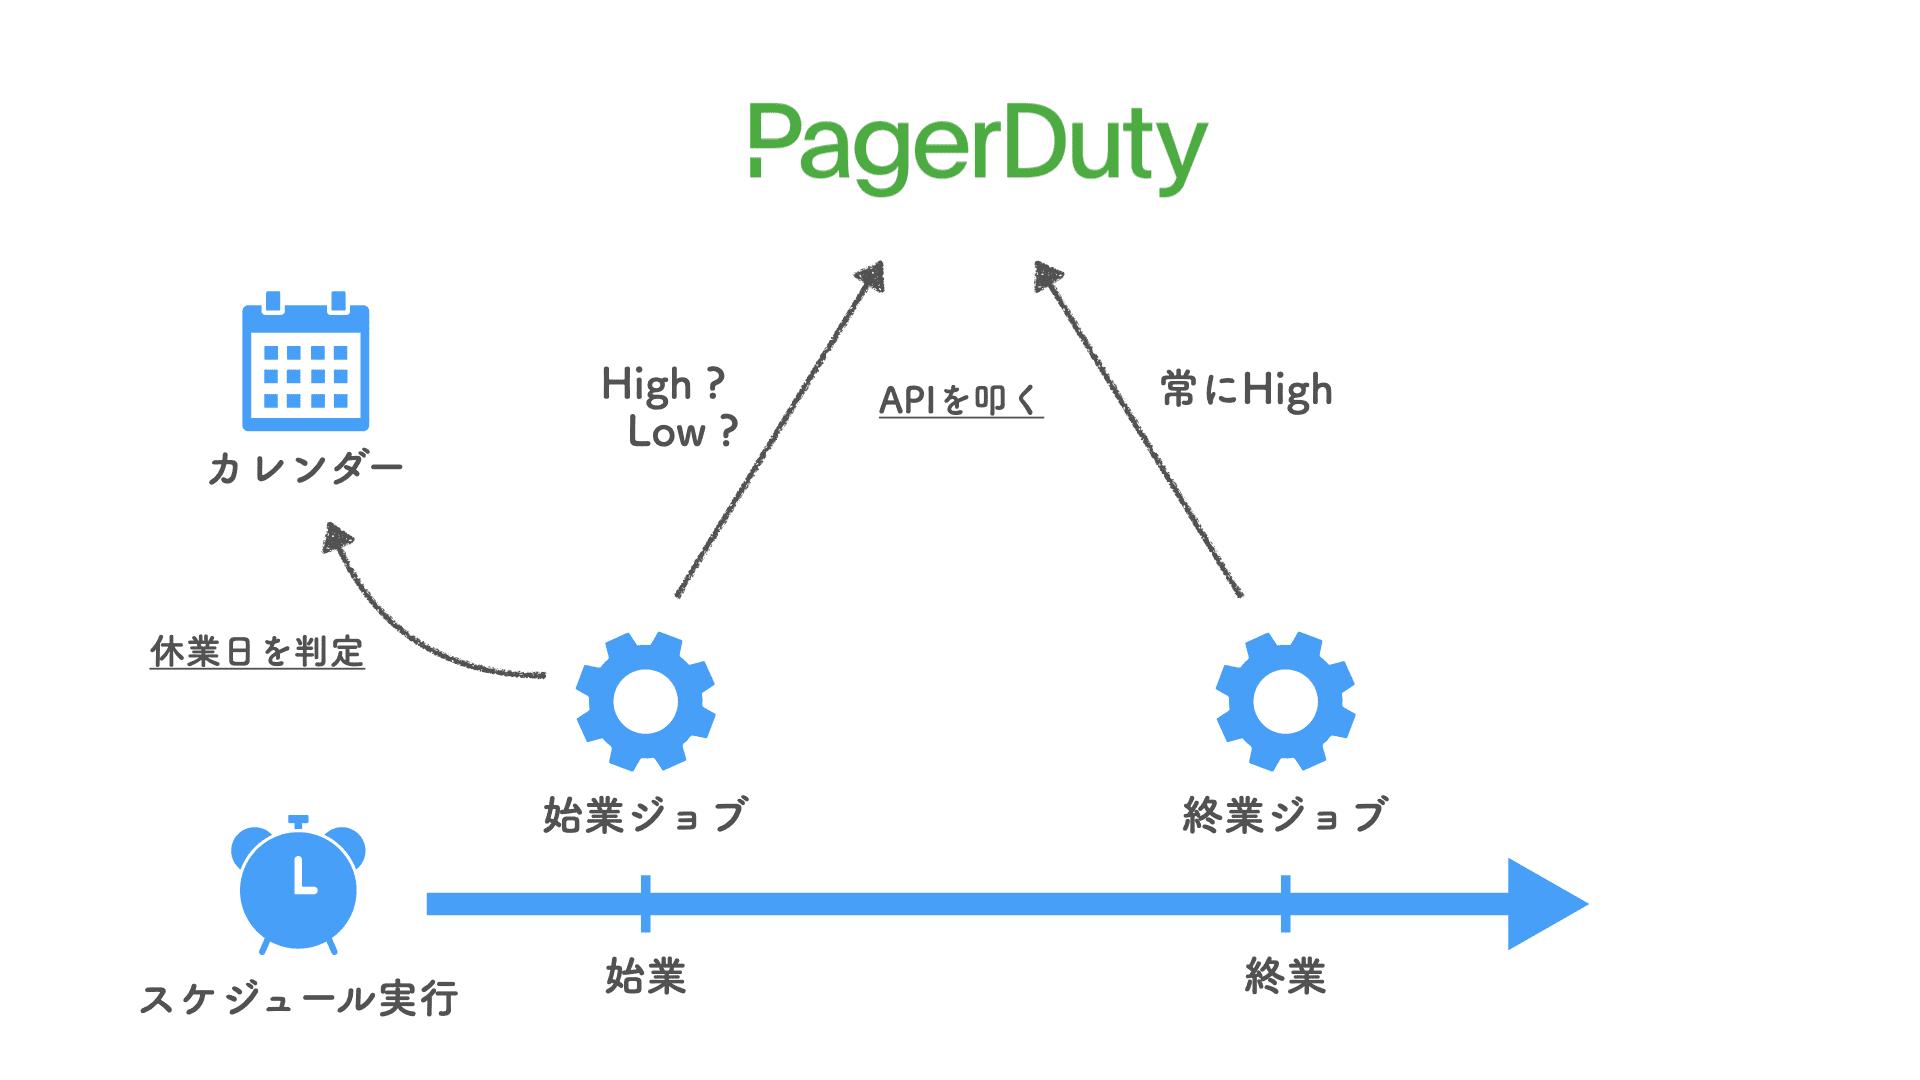 PagerDuty の通知ルールを自社の営業日カレンダーに基づいて制御する